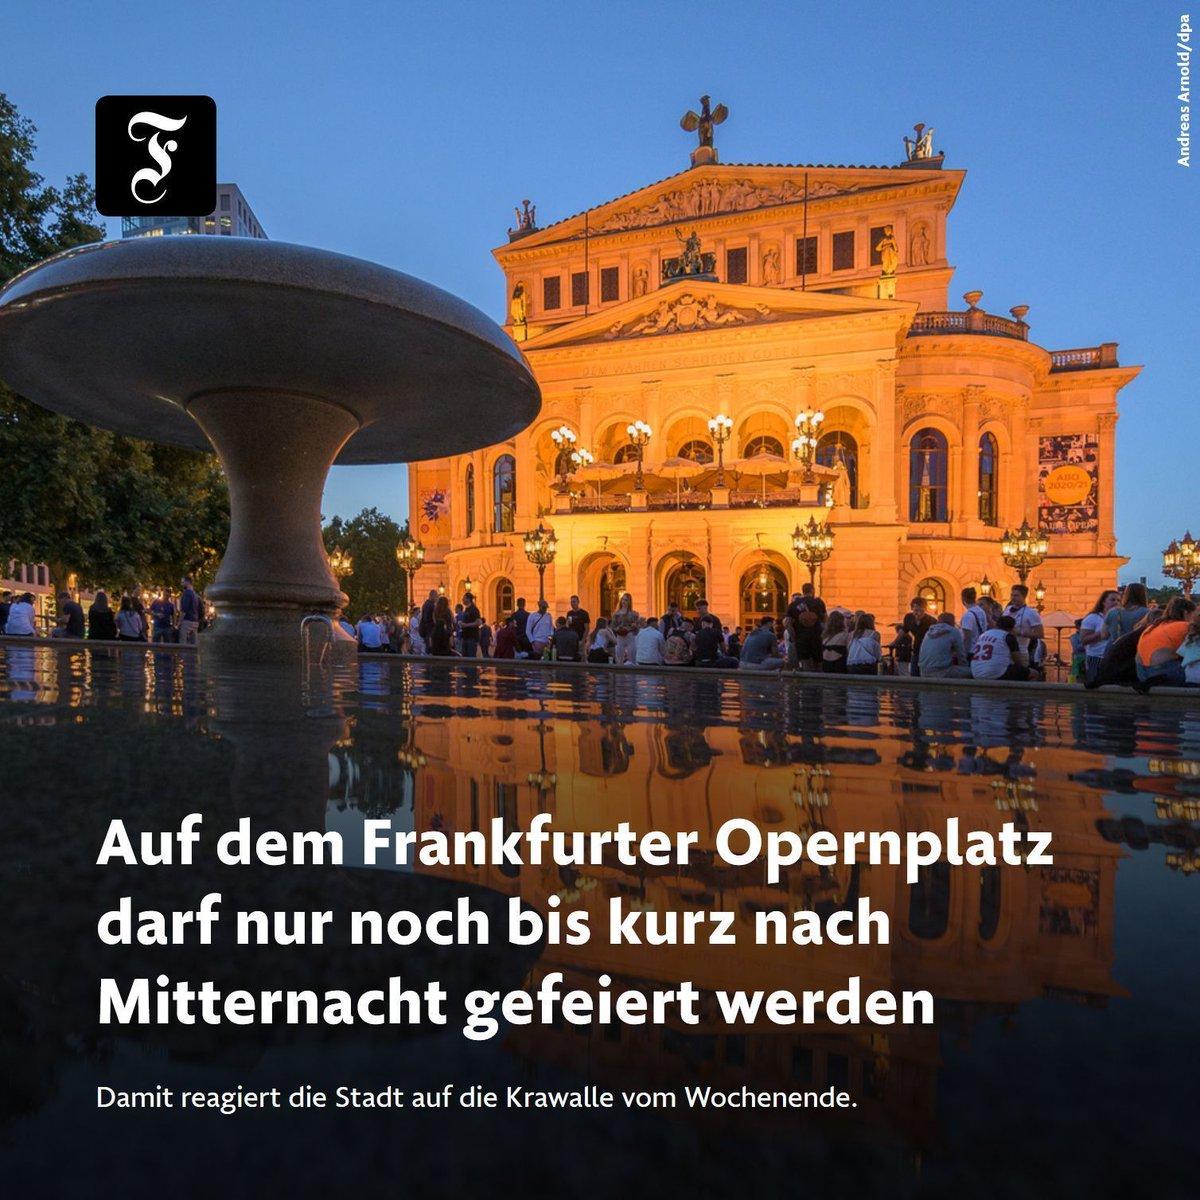 #Opernplatz